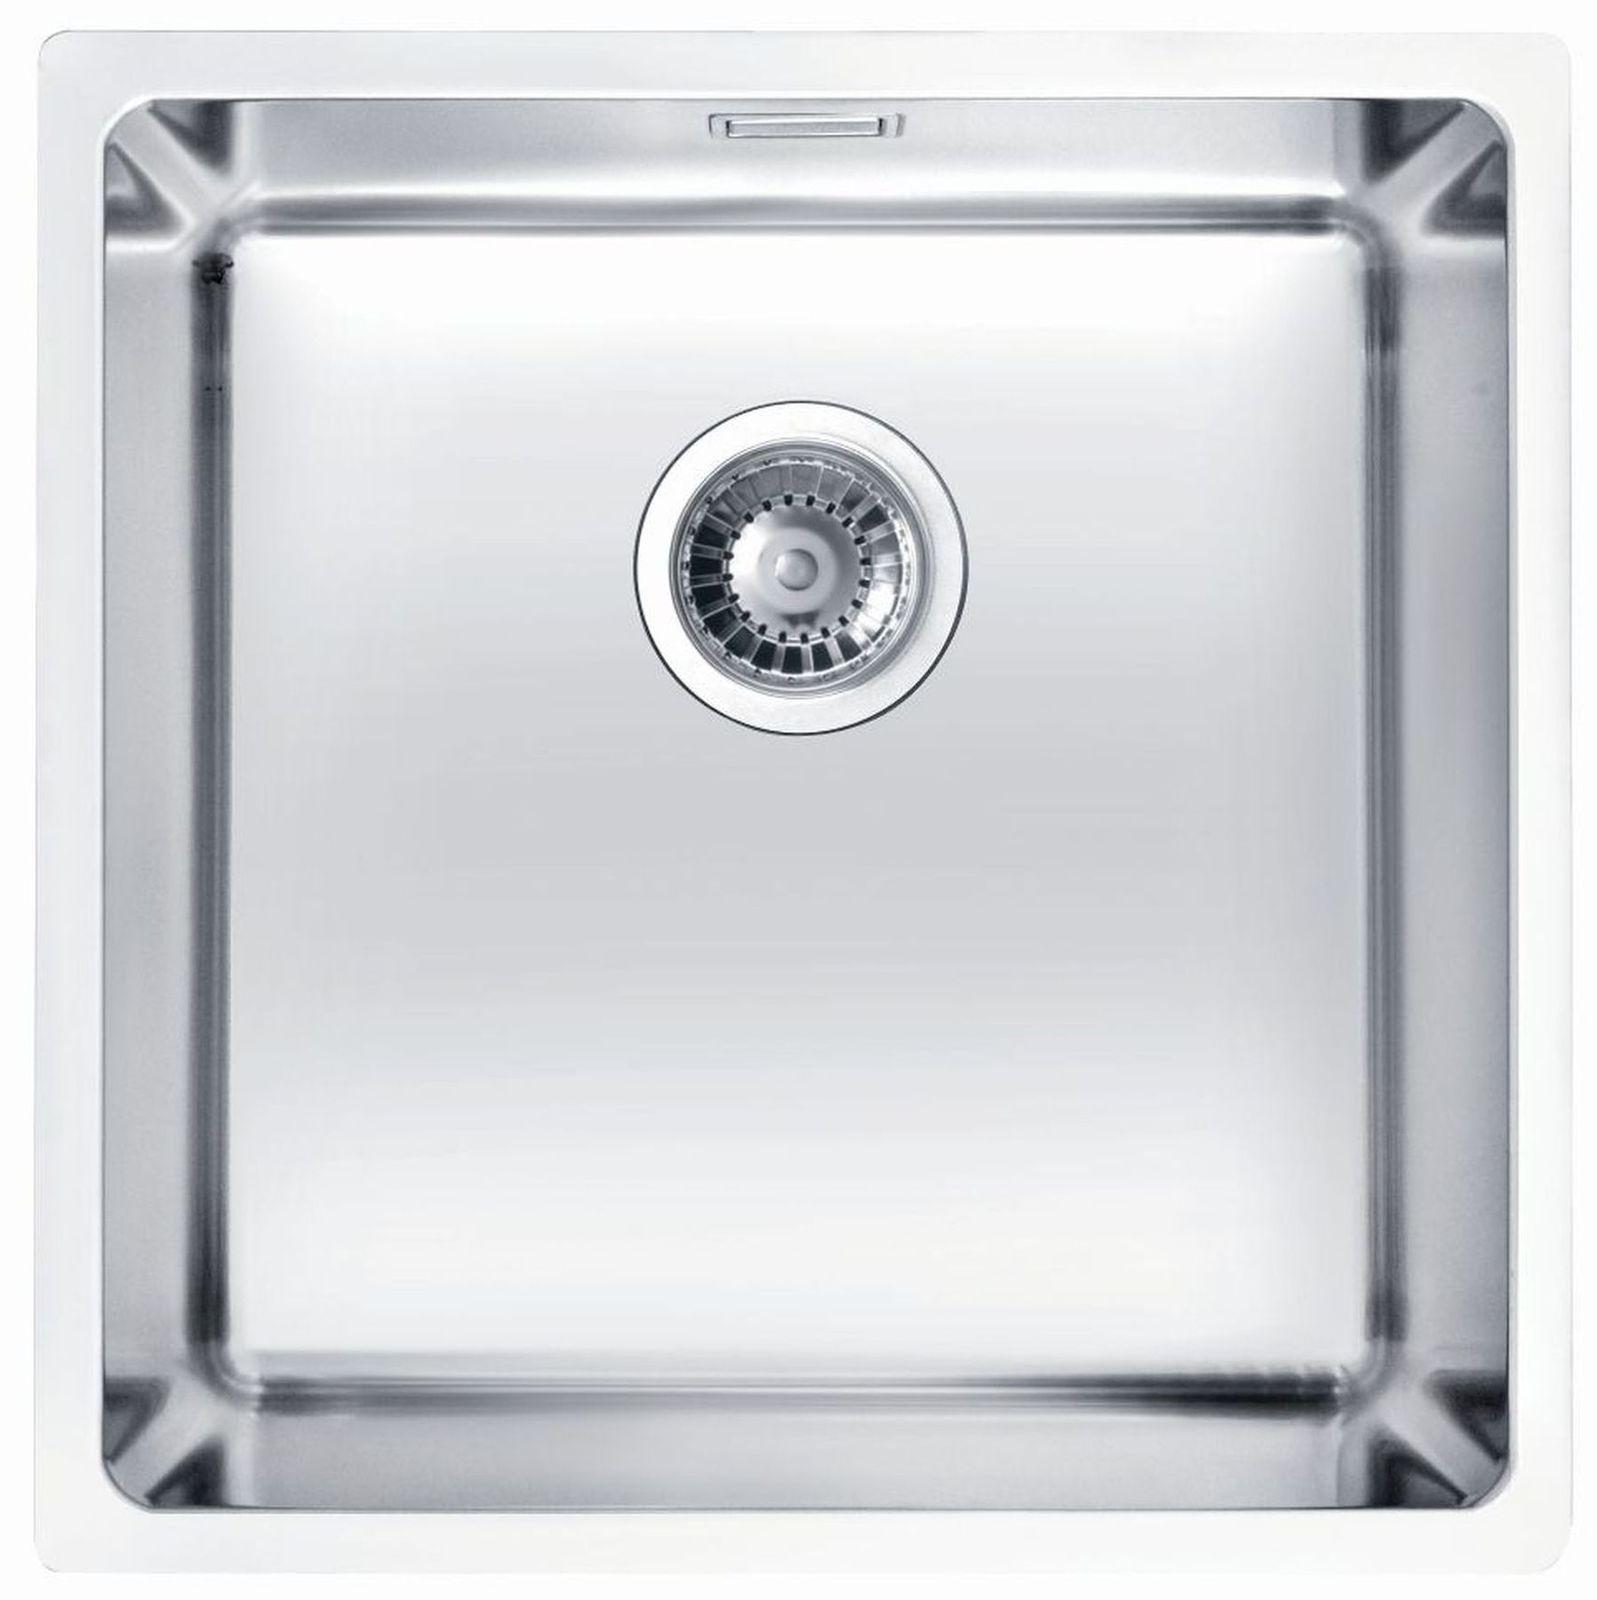 Alveus Küchen Unterbauspüle 440 x 440 x 195 mm Edelstahl ...